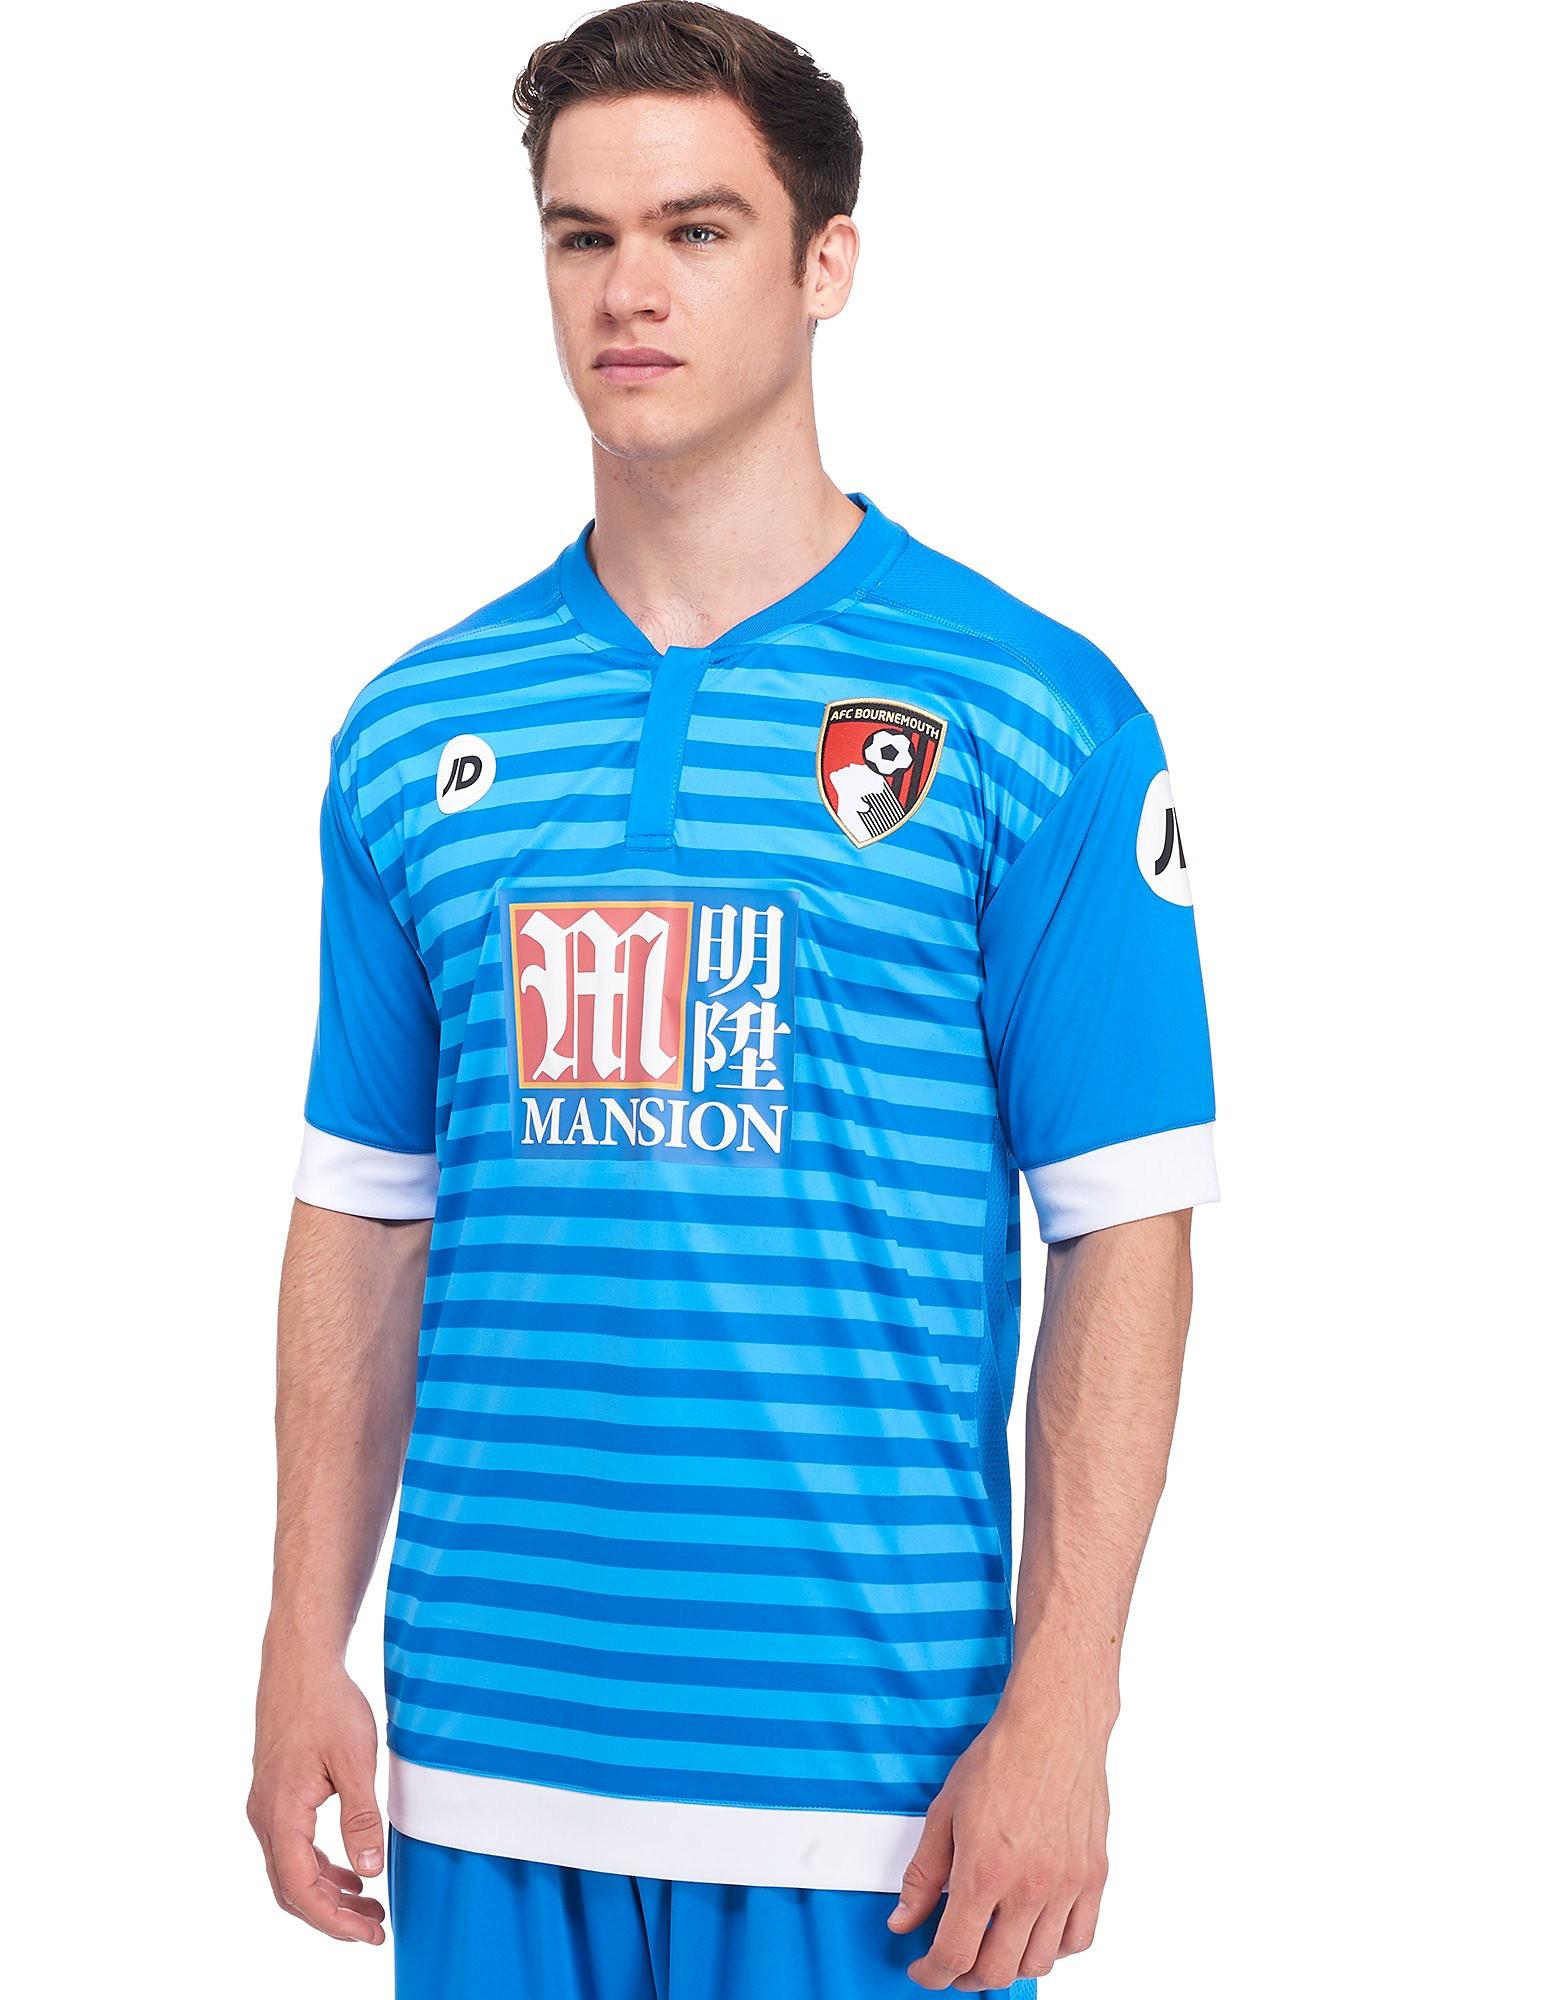 JD AFC Bournemouth 2016/17 Away Shirt